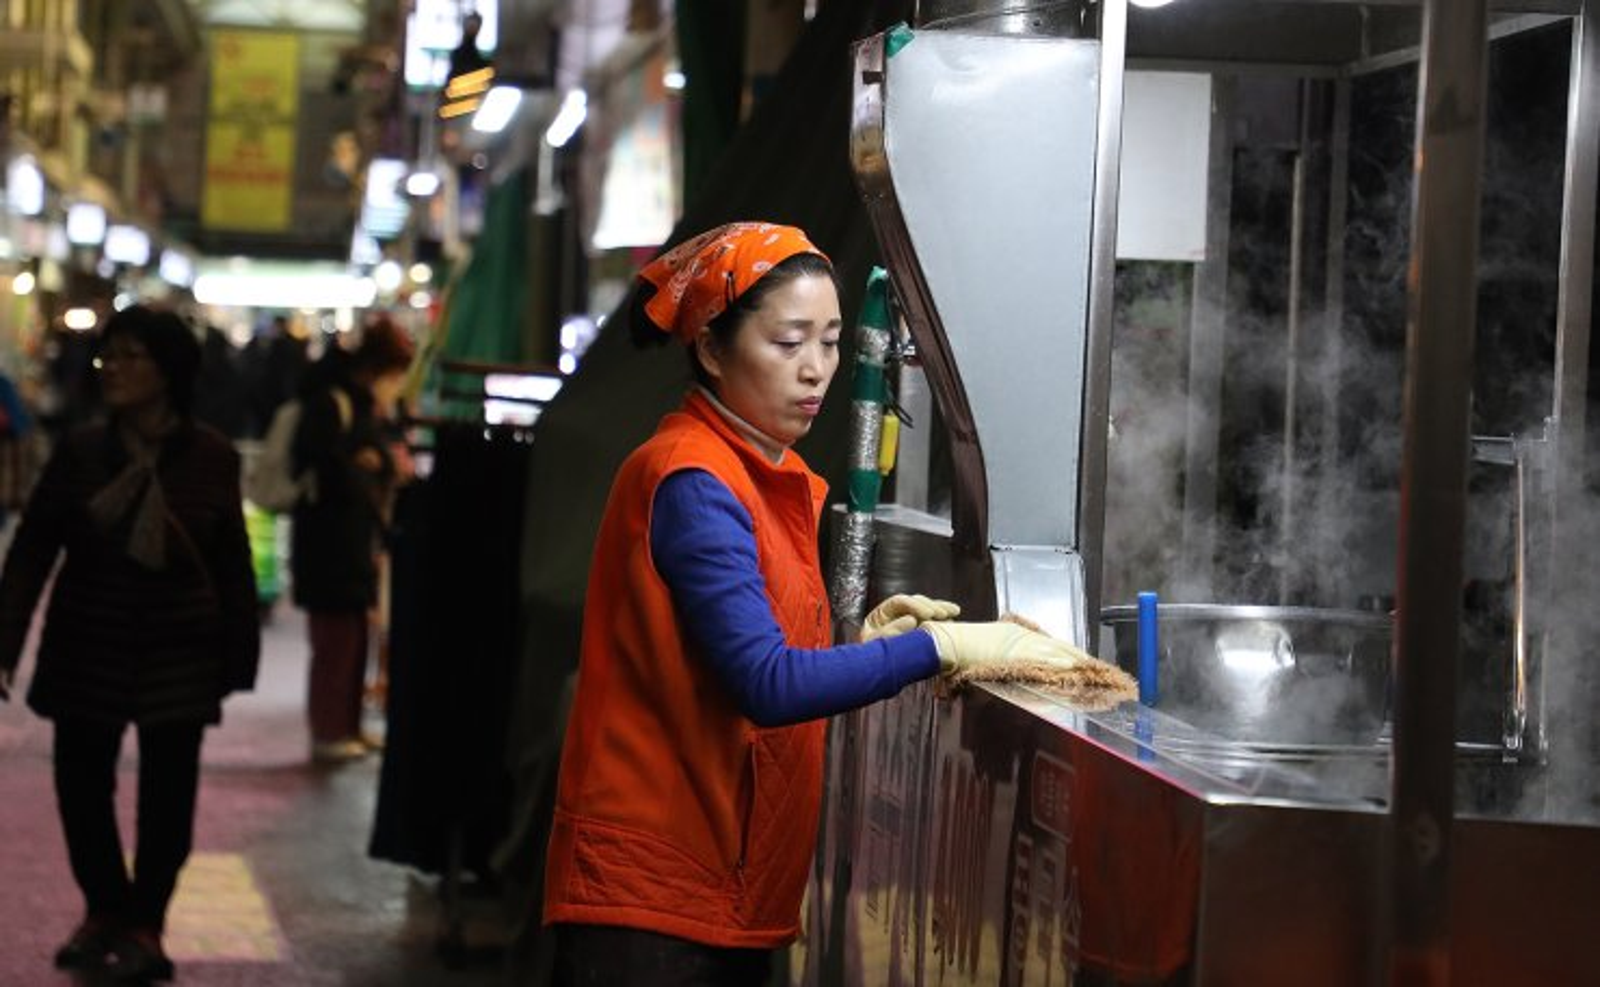 A food vendor waits for the customers at a market at a market in Seoul, South Korea, Monday, Feb. 24, 2020. Korea Times photo by Choi Won-suk